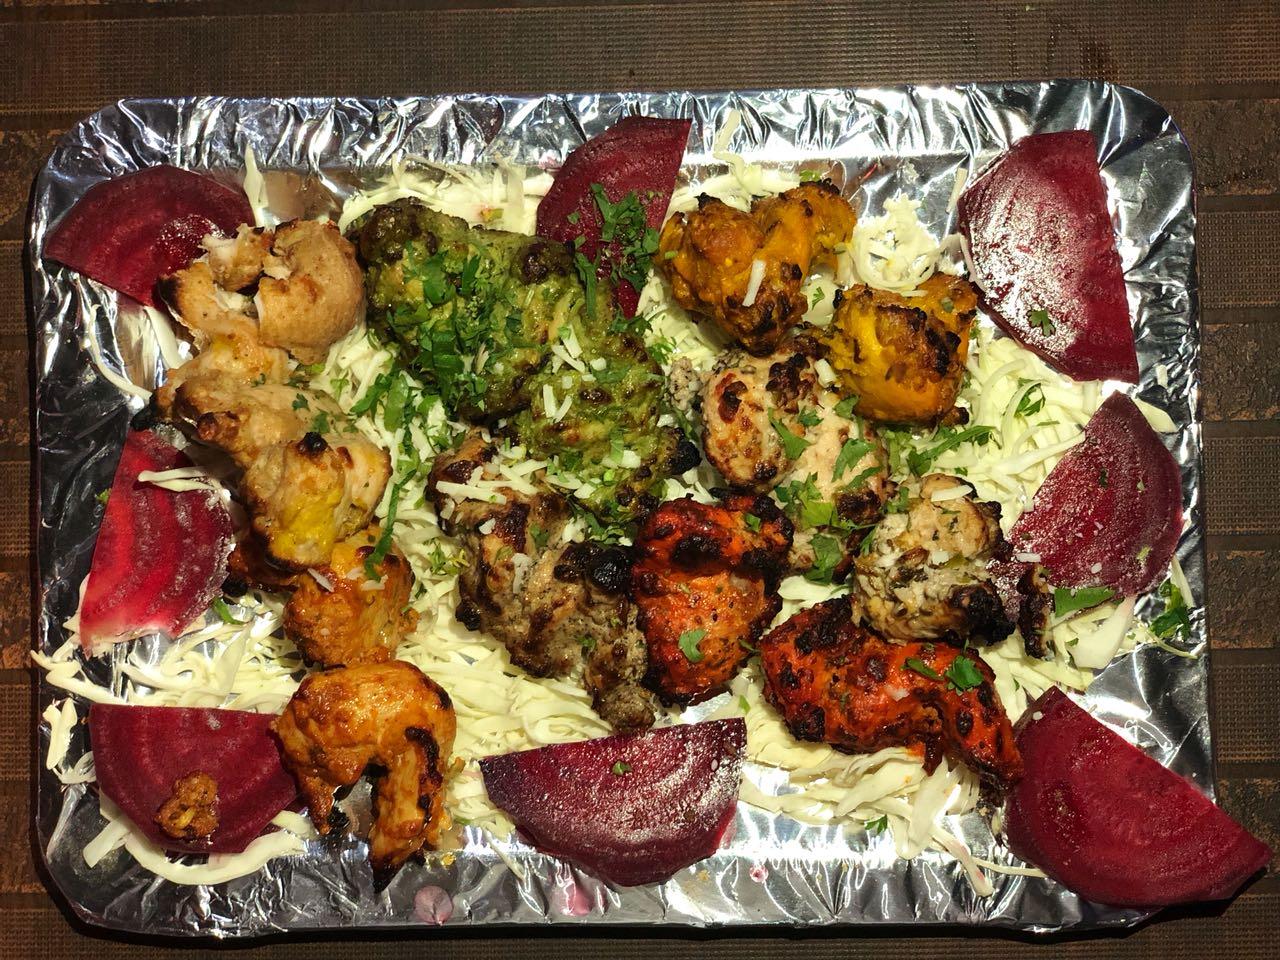 Chicken Mini Platter, platter, sizzlers, dhaba ka khaana